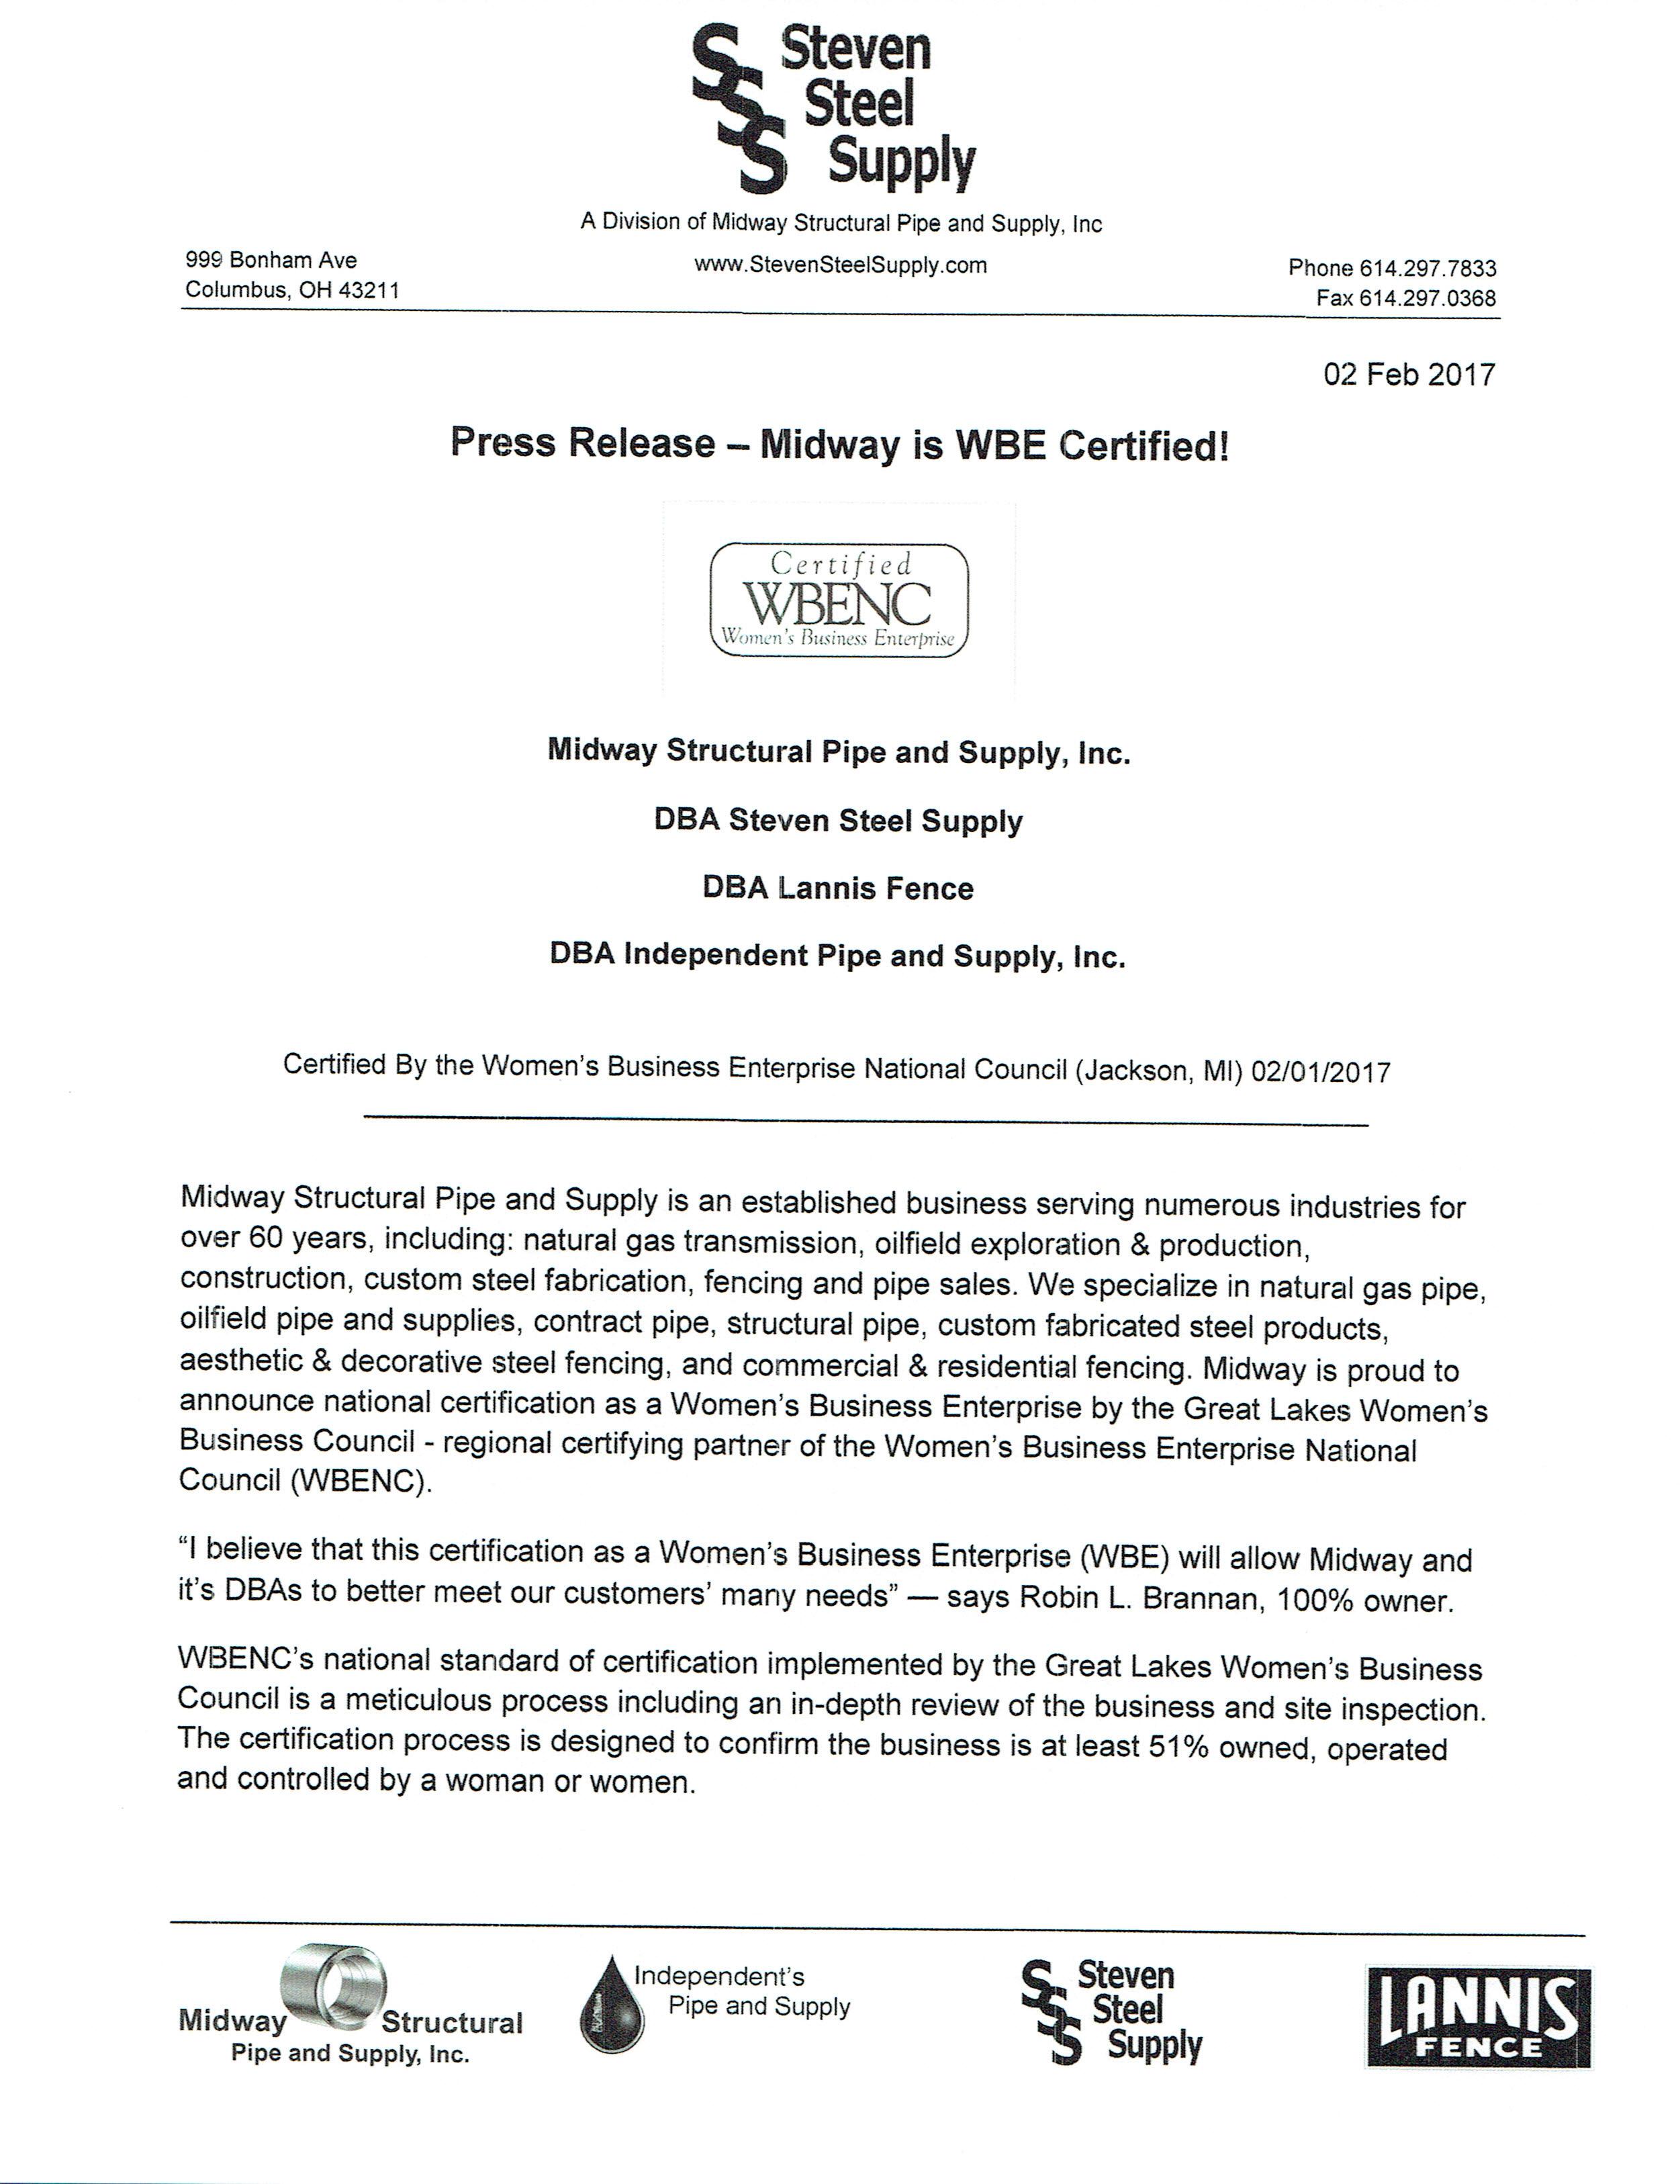 Steven Steel Wbe Certification News Item Details Steven Steel